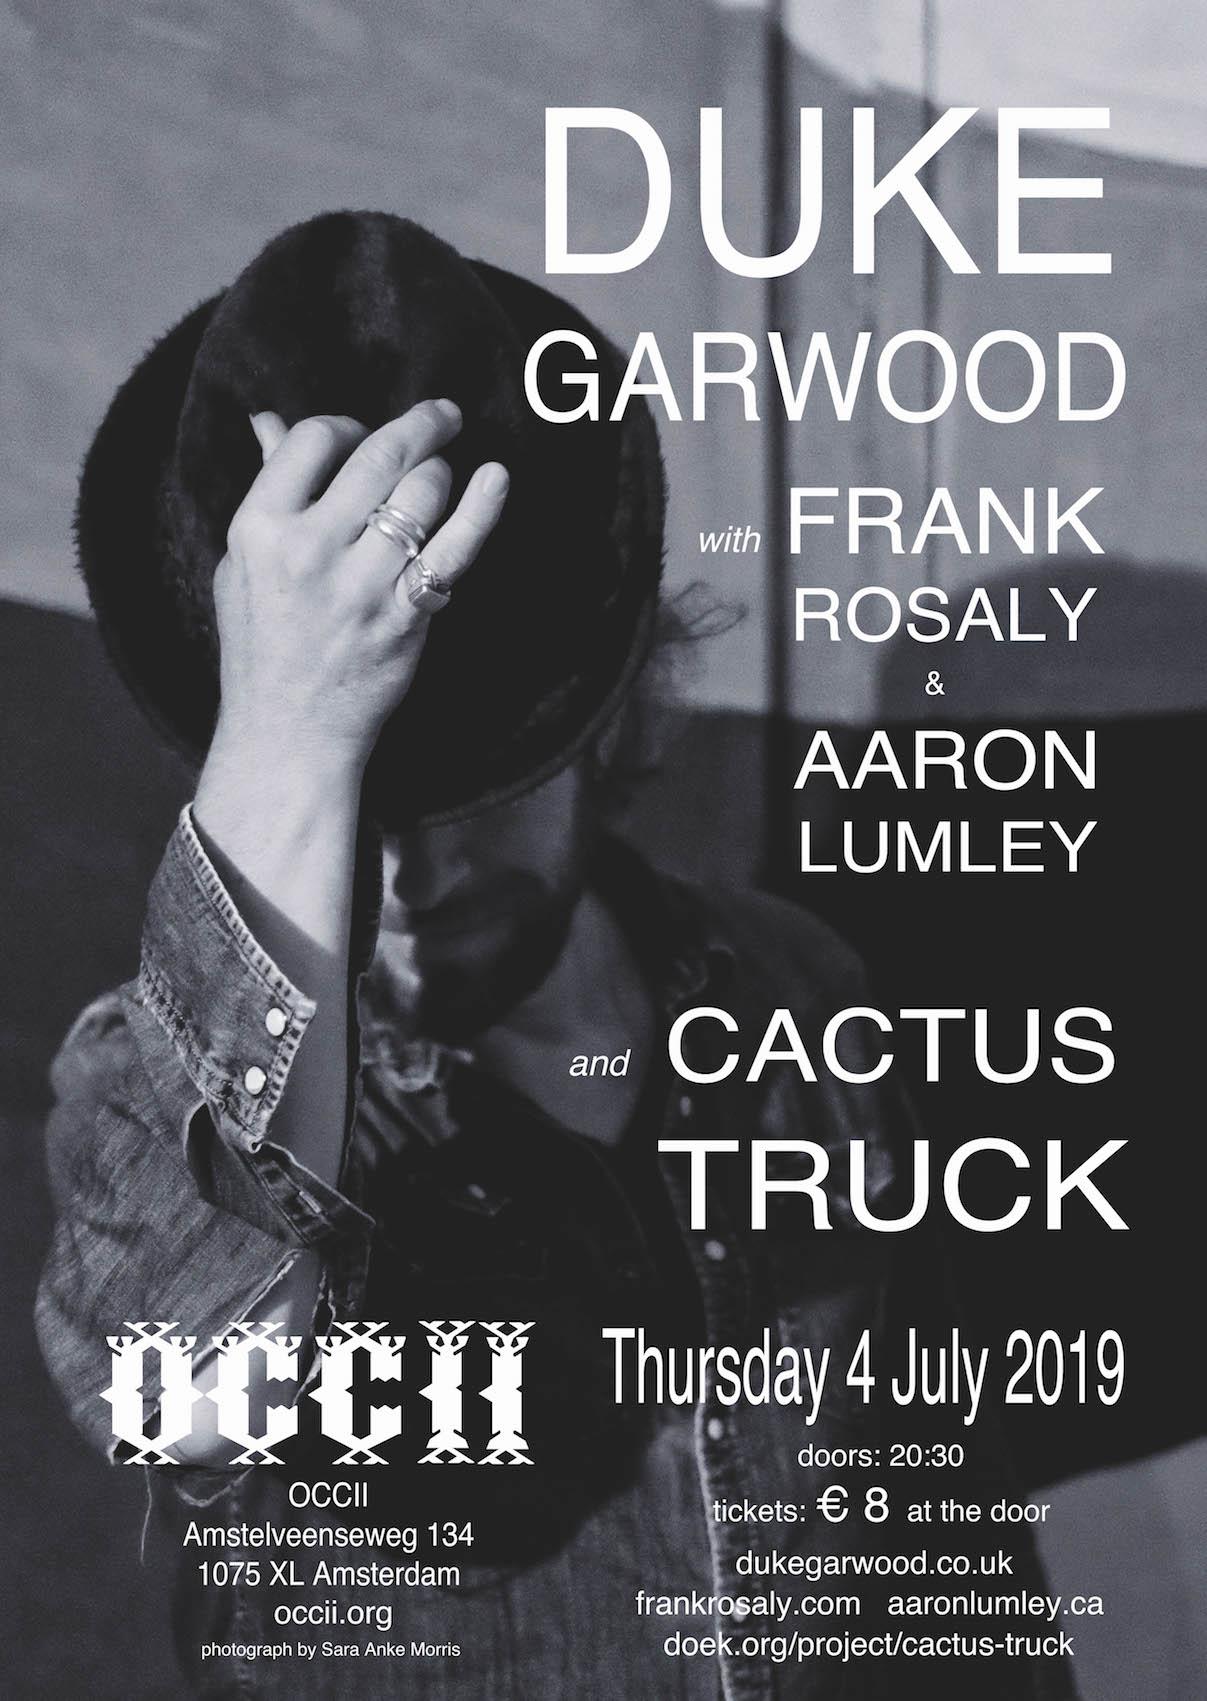 Duke Garwood (UK) w/ Frank Rosaly (US) & Aaron Lumley (CA) + CACTUS TRUCK